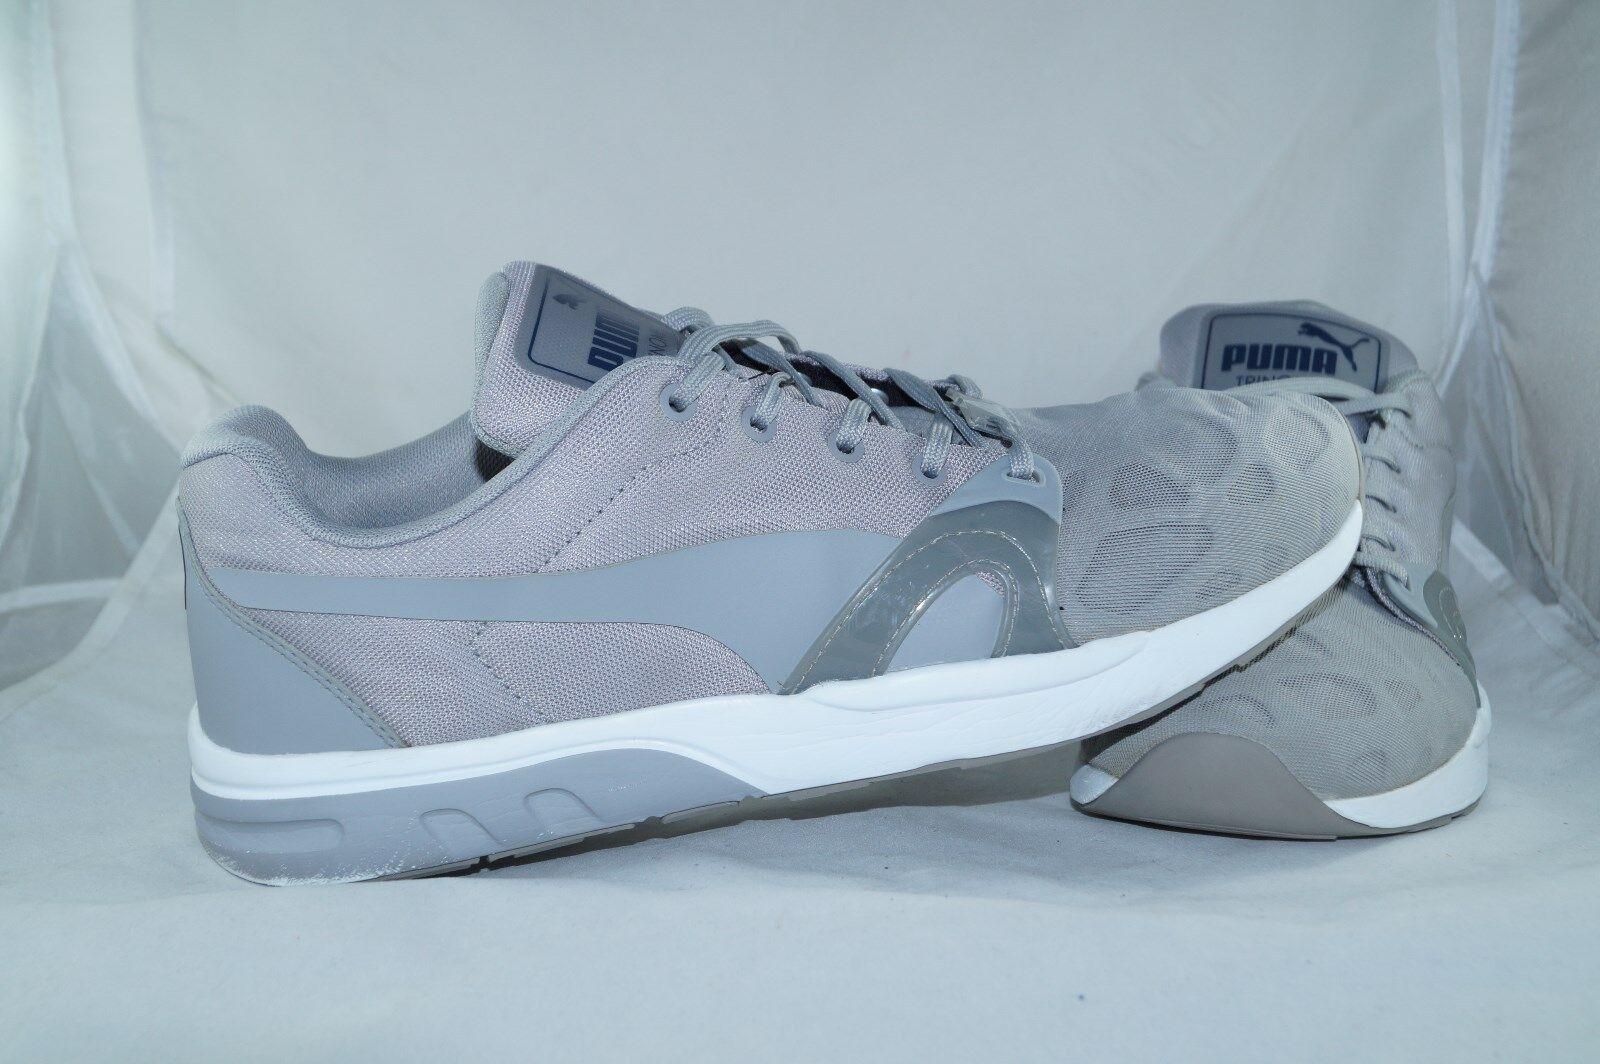 PUMA  XT S Foam Trinomic GR: 44,5 Grau Laufschuhe Sportschuhe